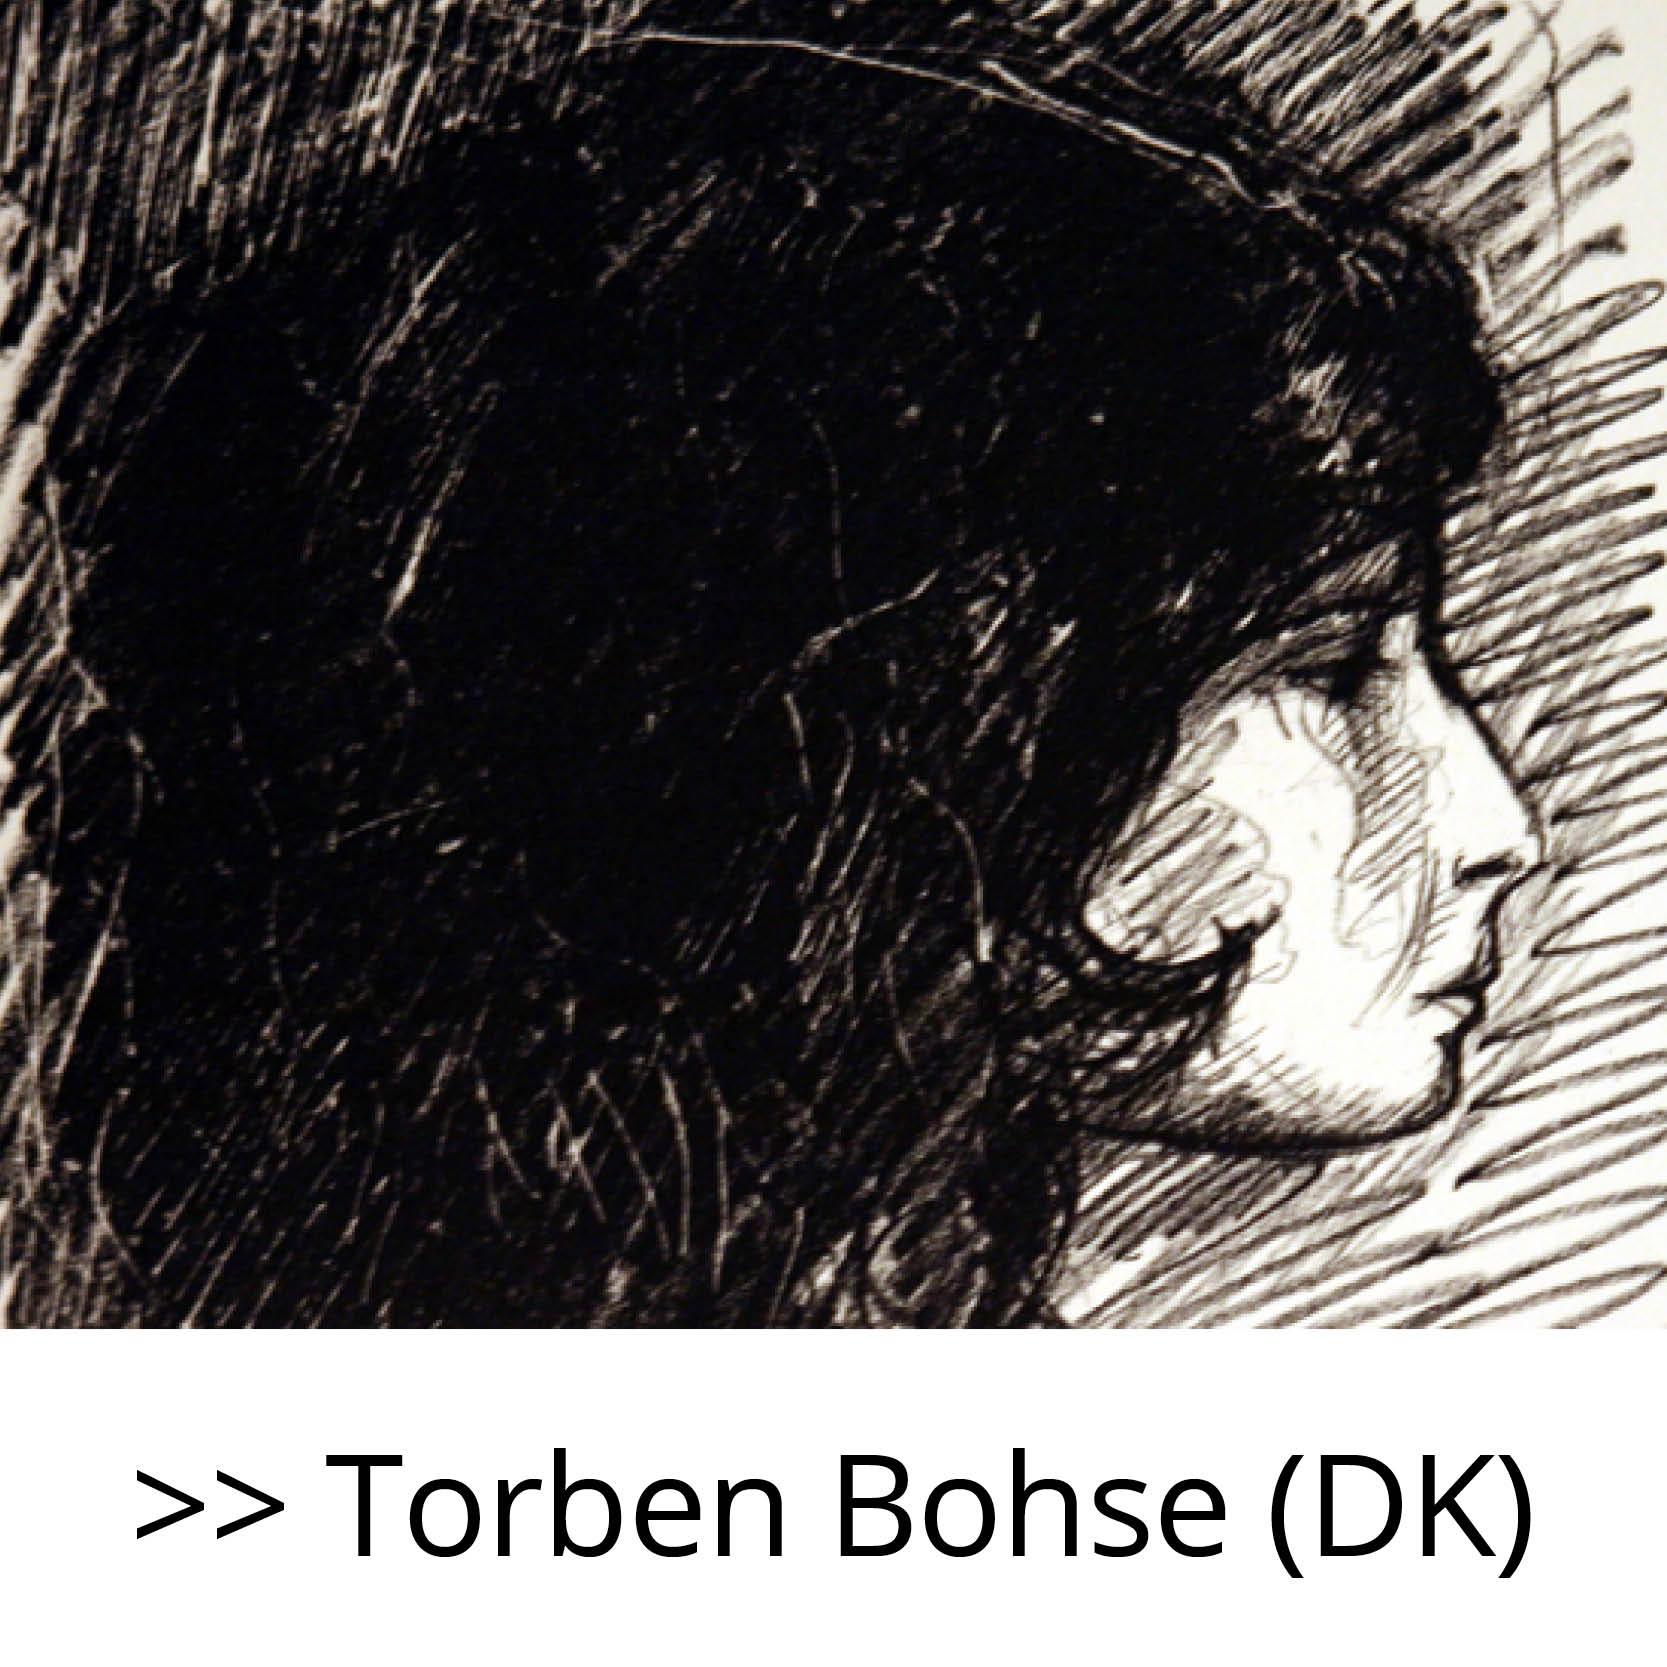 Torben_Bohse_(DK)